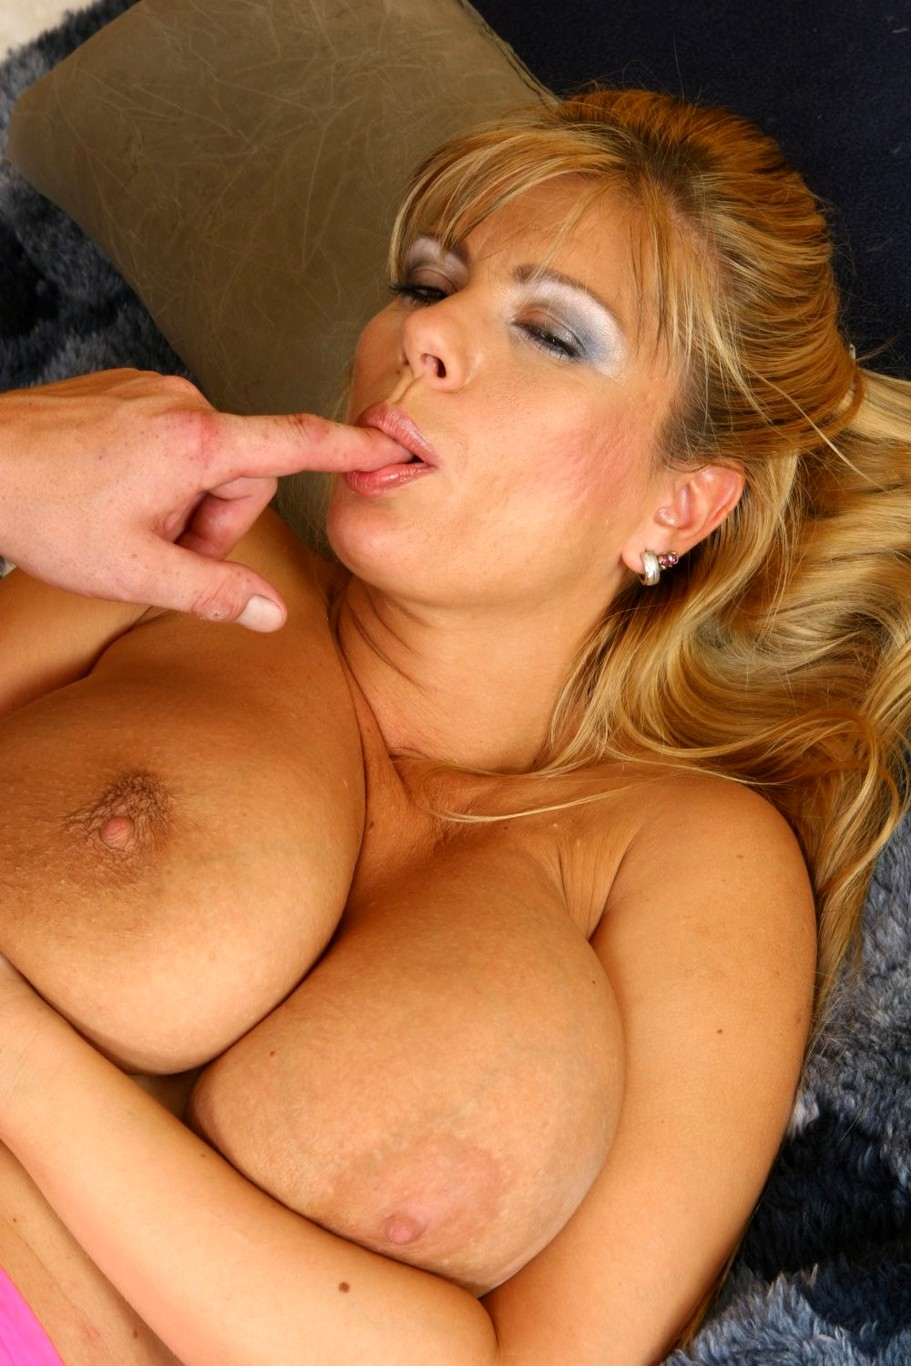 Big tit blonde milf pornstar